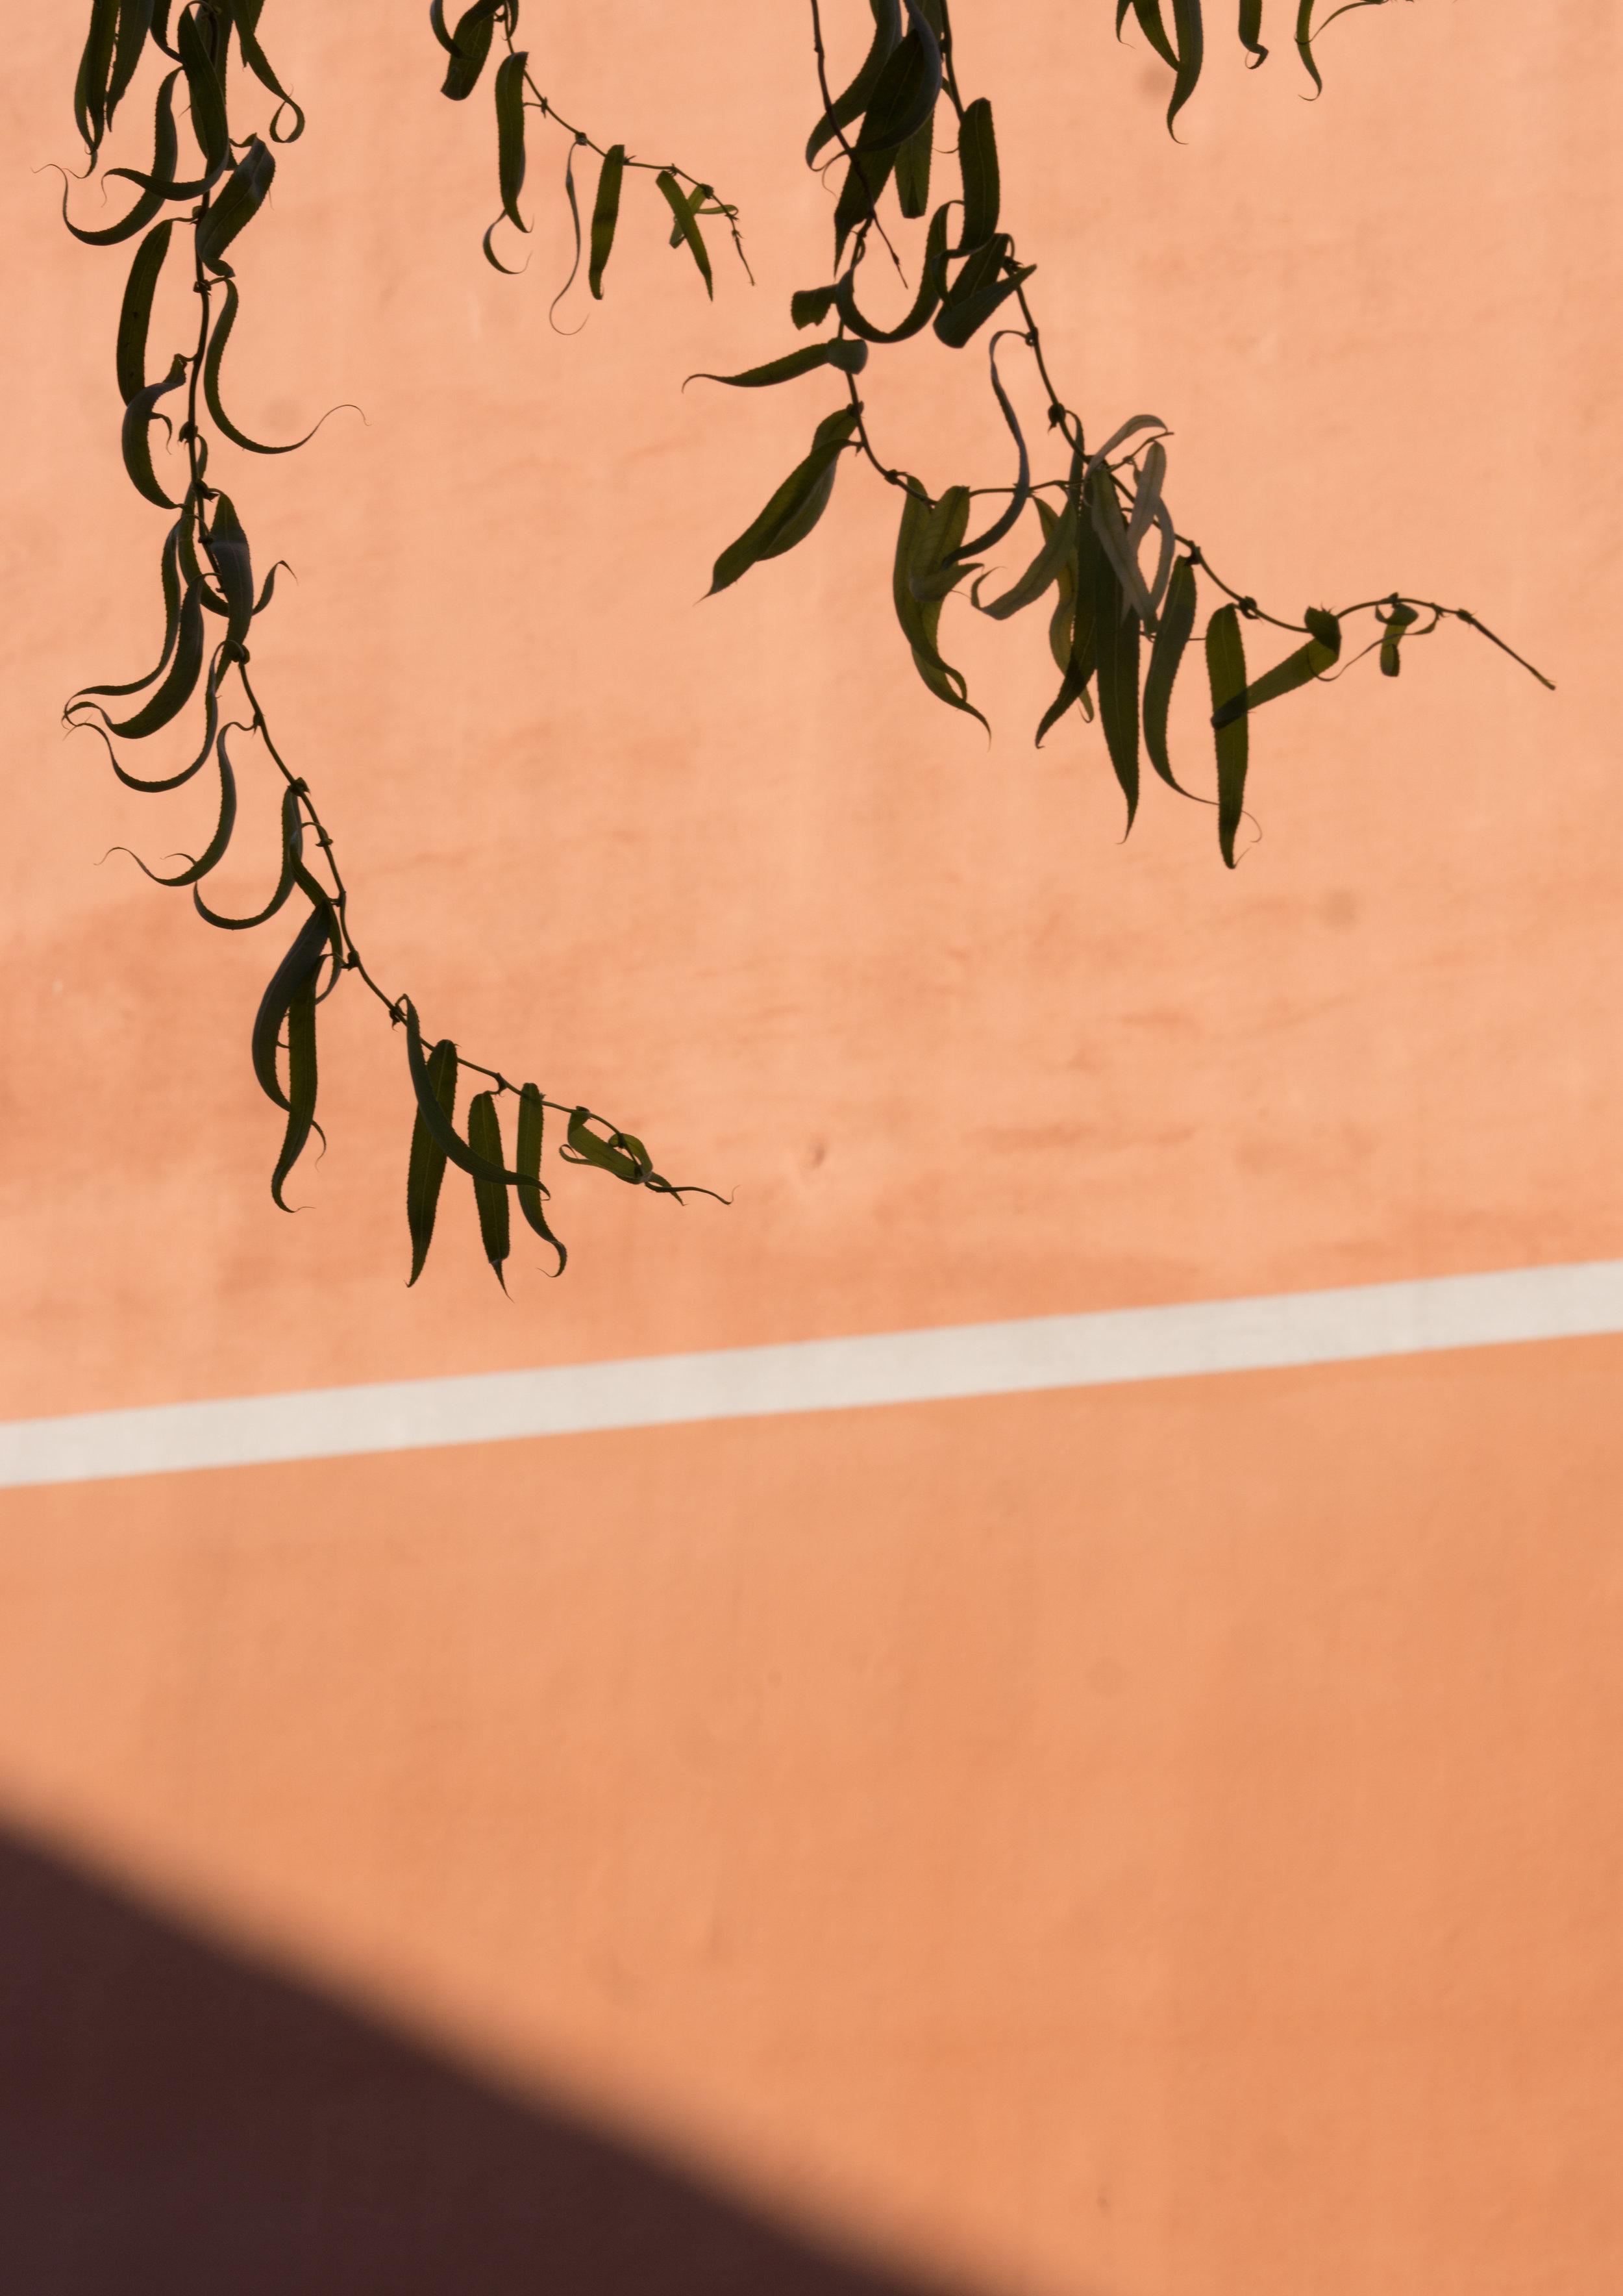 2018_Sedona Walker-Morrissey-3.jpg